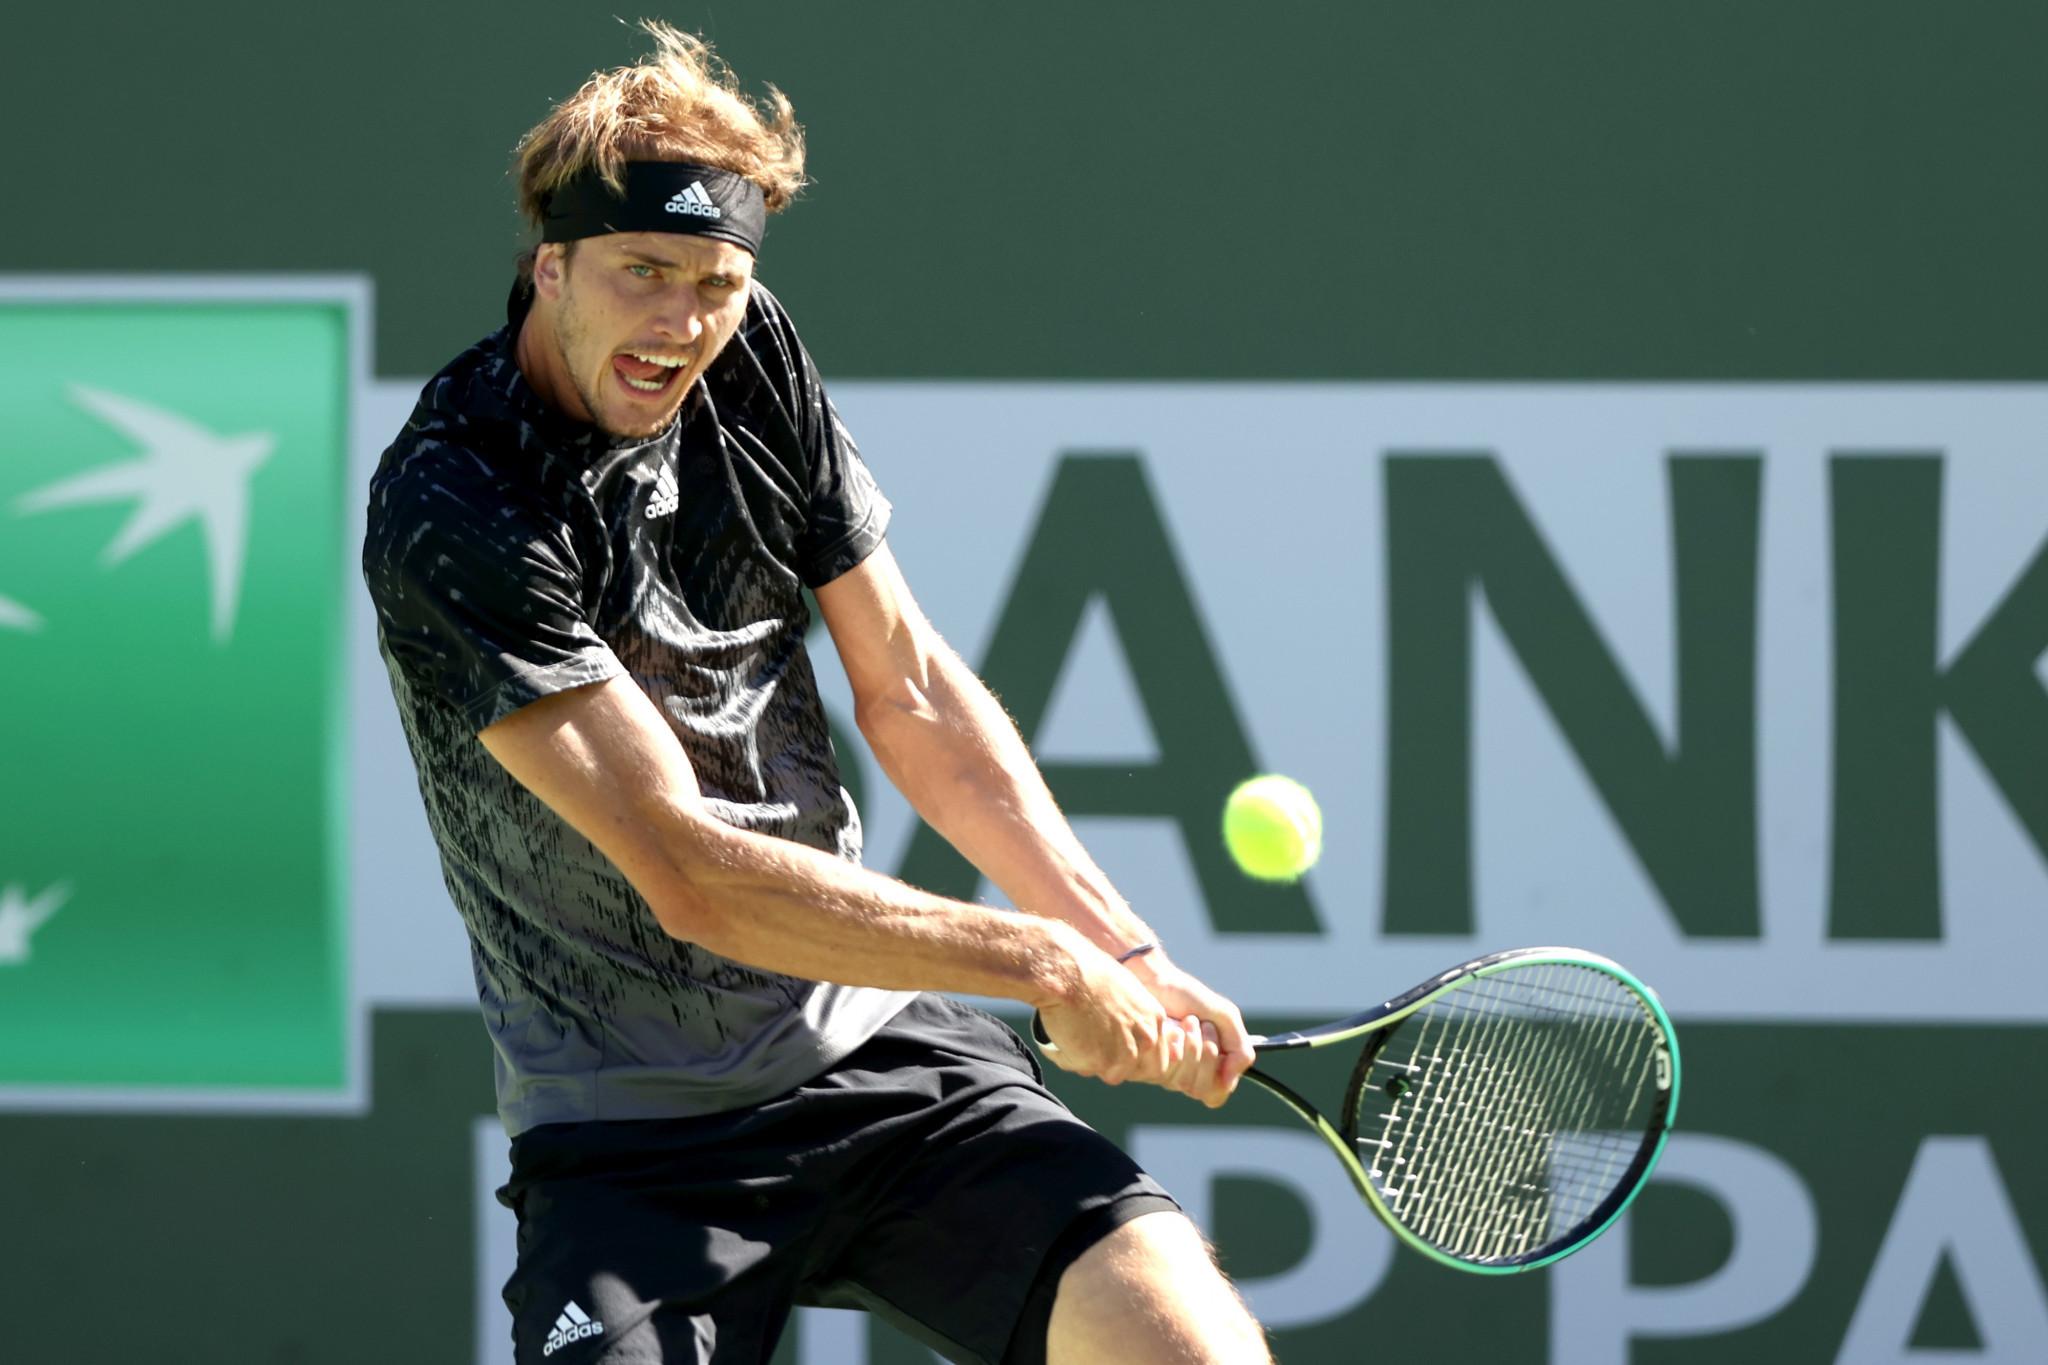 Zverev refuses to compete in Davis Cup Finals as Djokovic headlines line-up